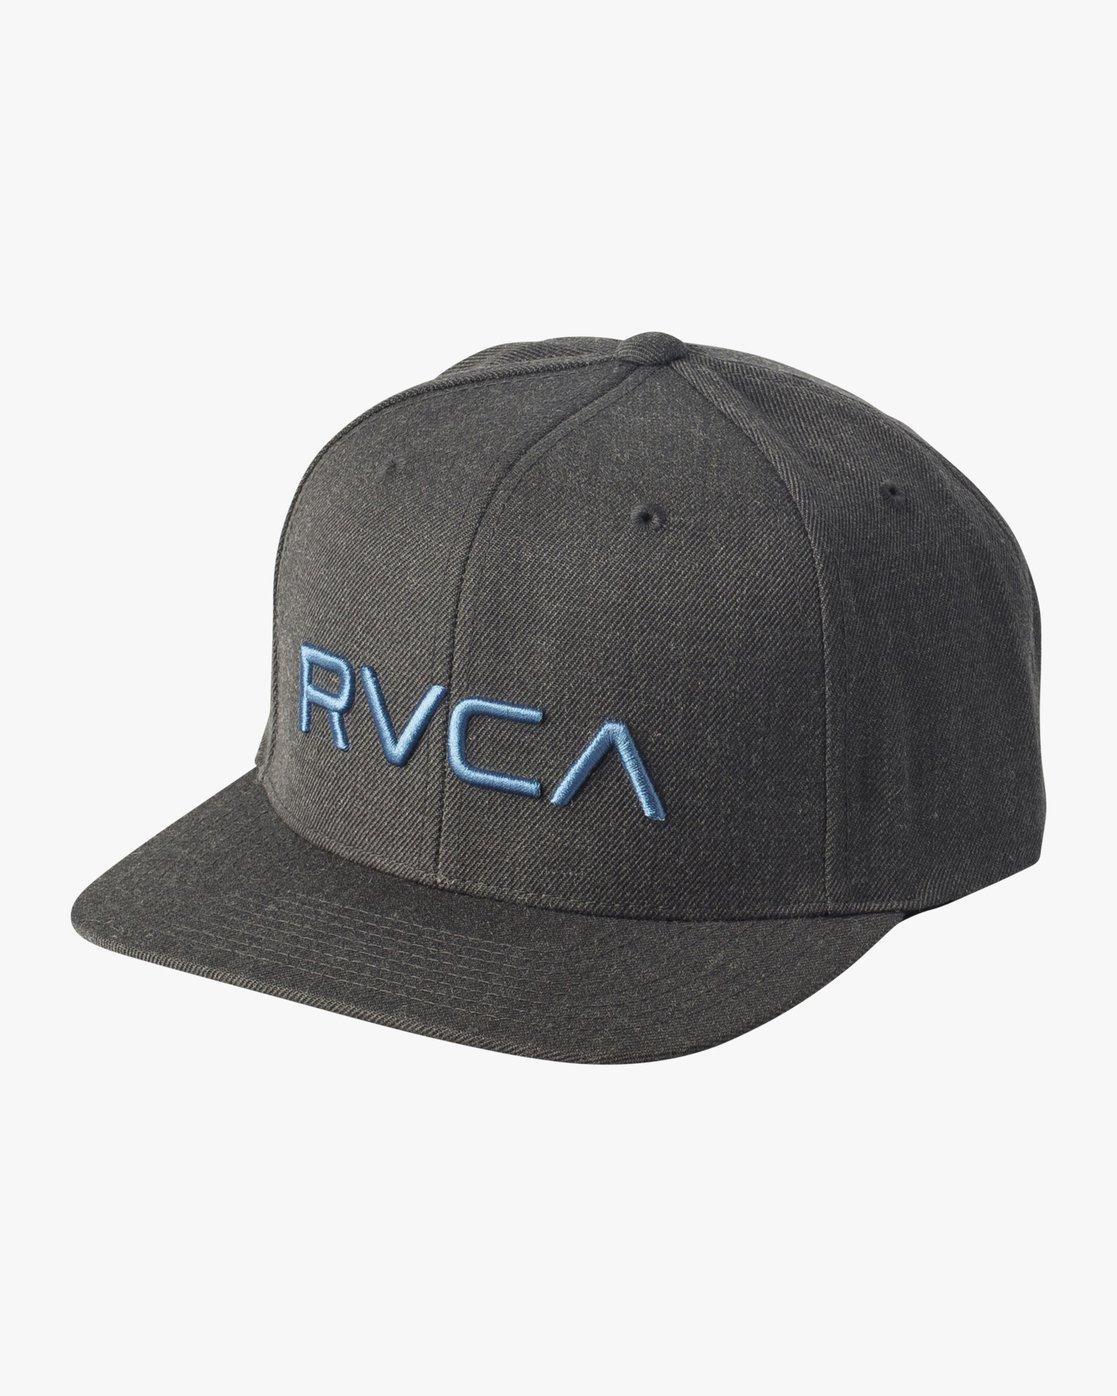 0 RVCA Twill Snapback III Hat Grey MAAHWRSB RVCA